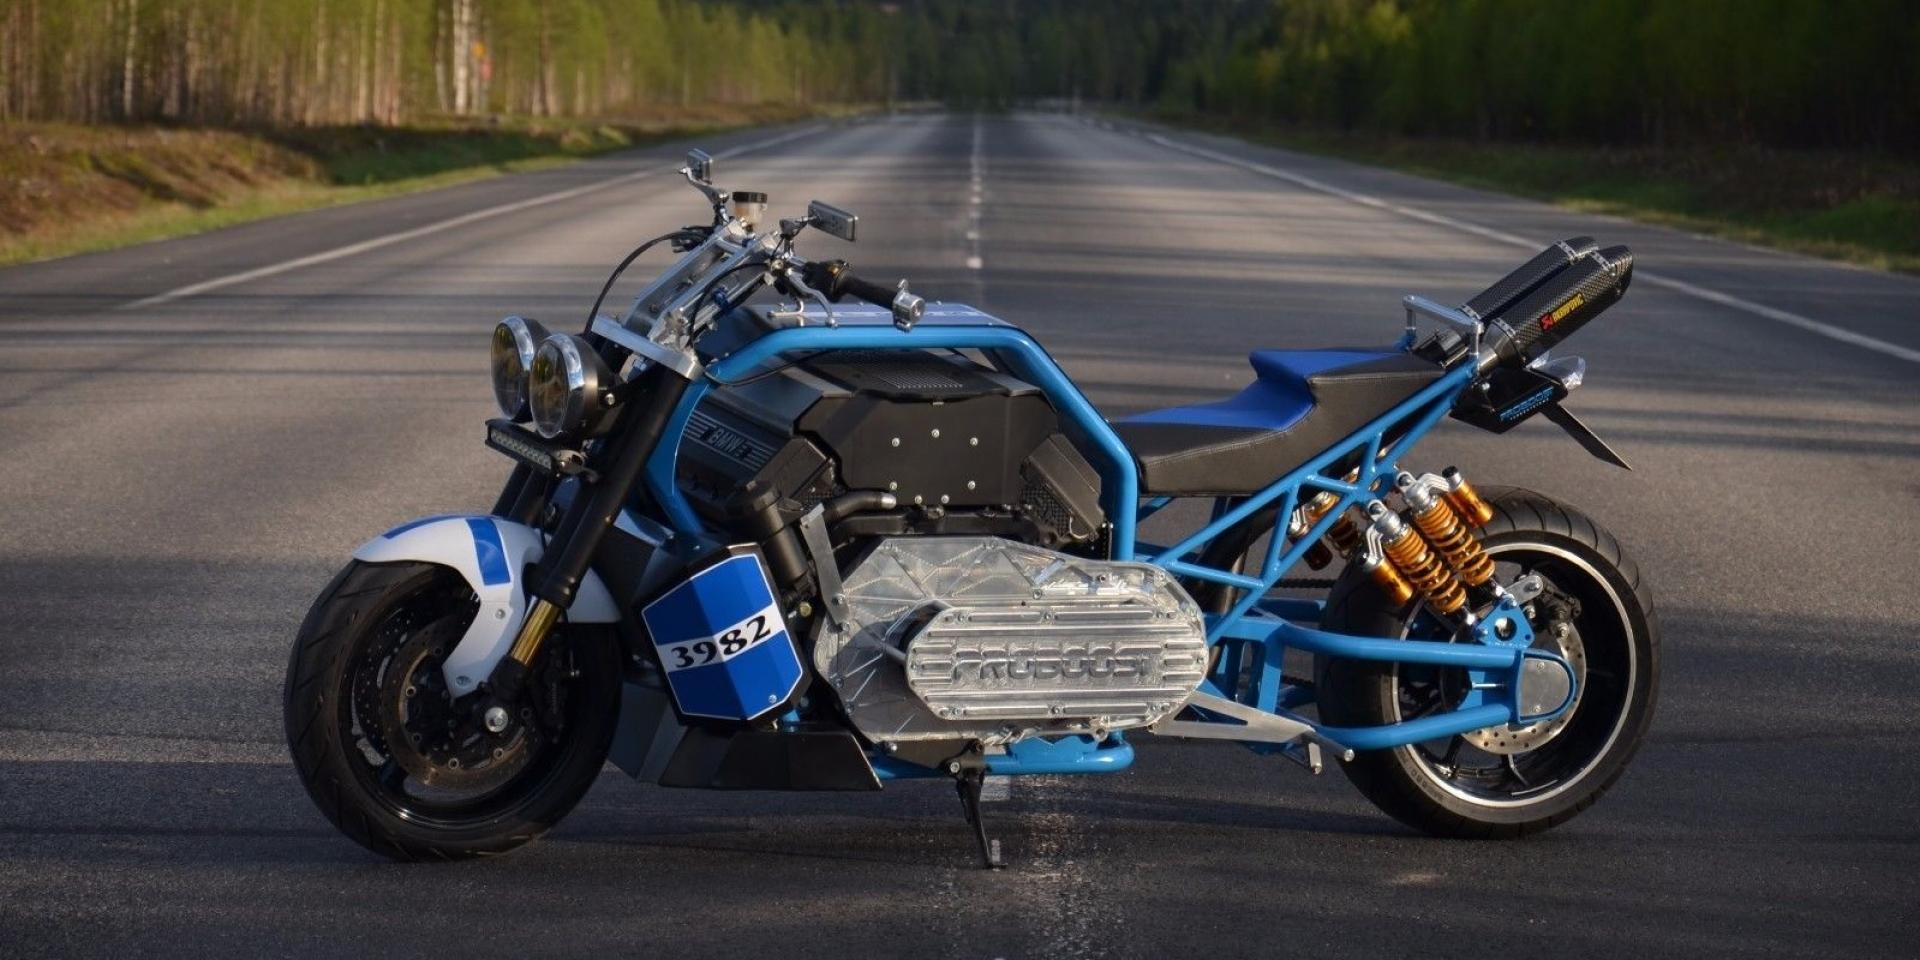 超越Y2K、H2R的怪物。M1 V8 4.0L Twin Turbo by PROBOOST